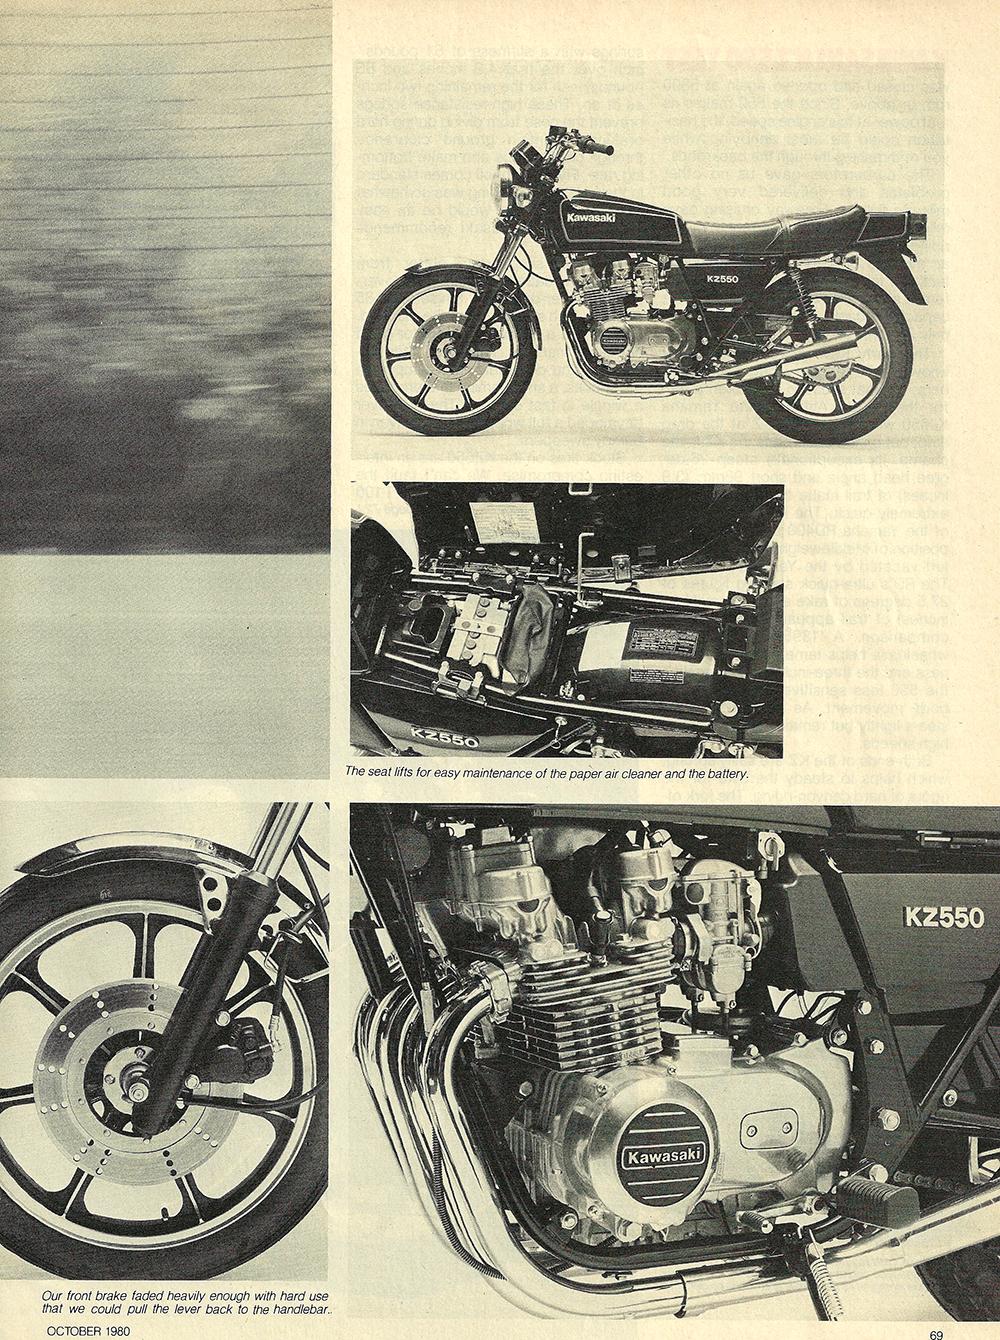 1980 Kawasaki KZ550 road test 03.jpg